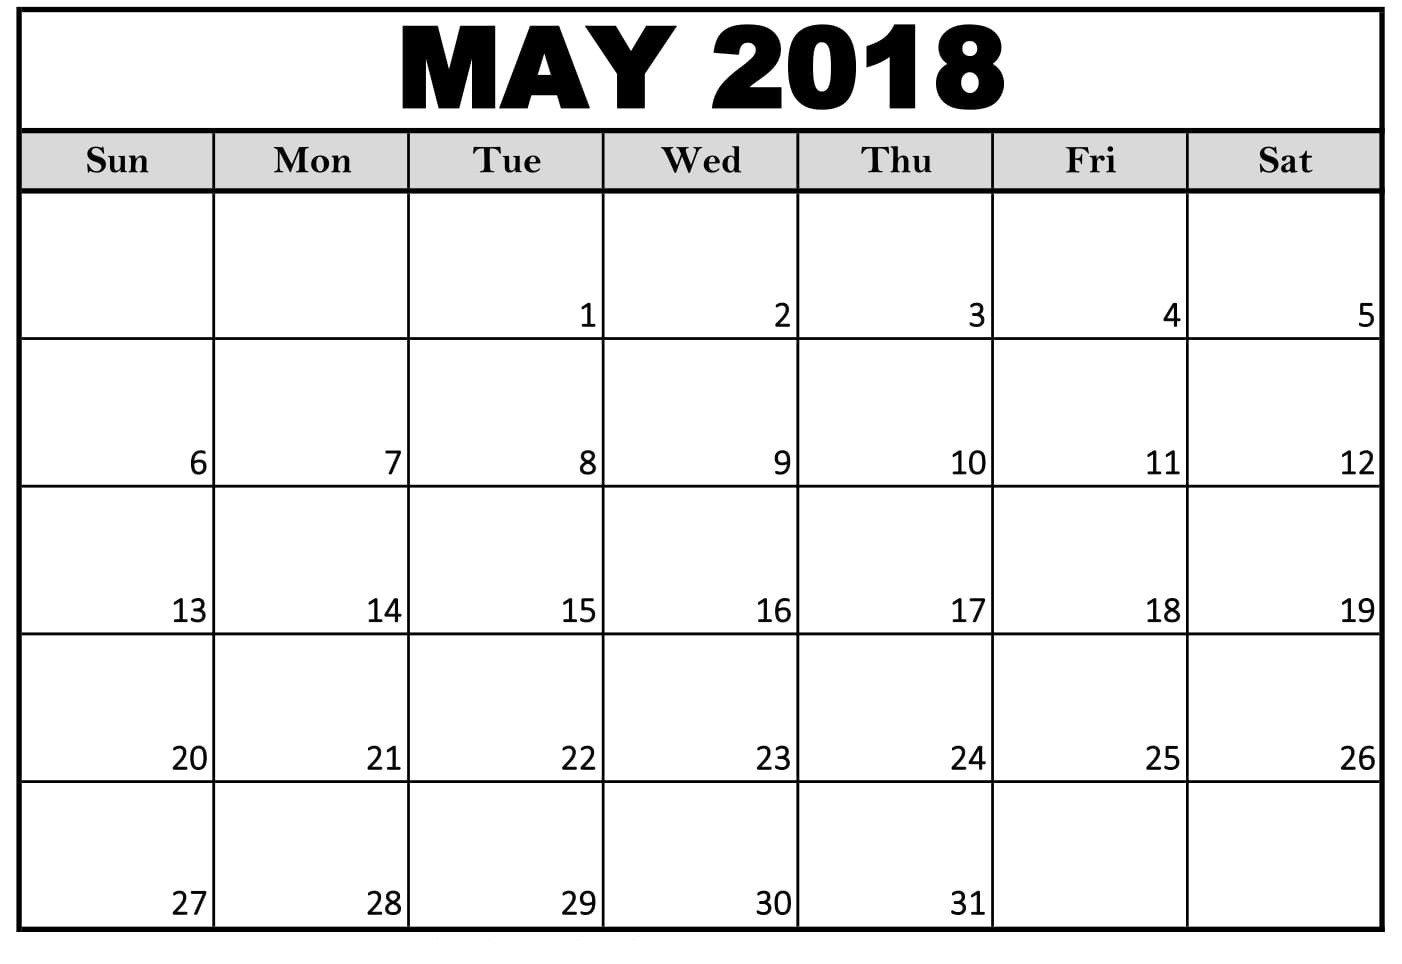 Free 5 May 2018 Calendar Printable Template Pdf May 2018 Calendar